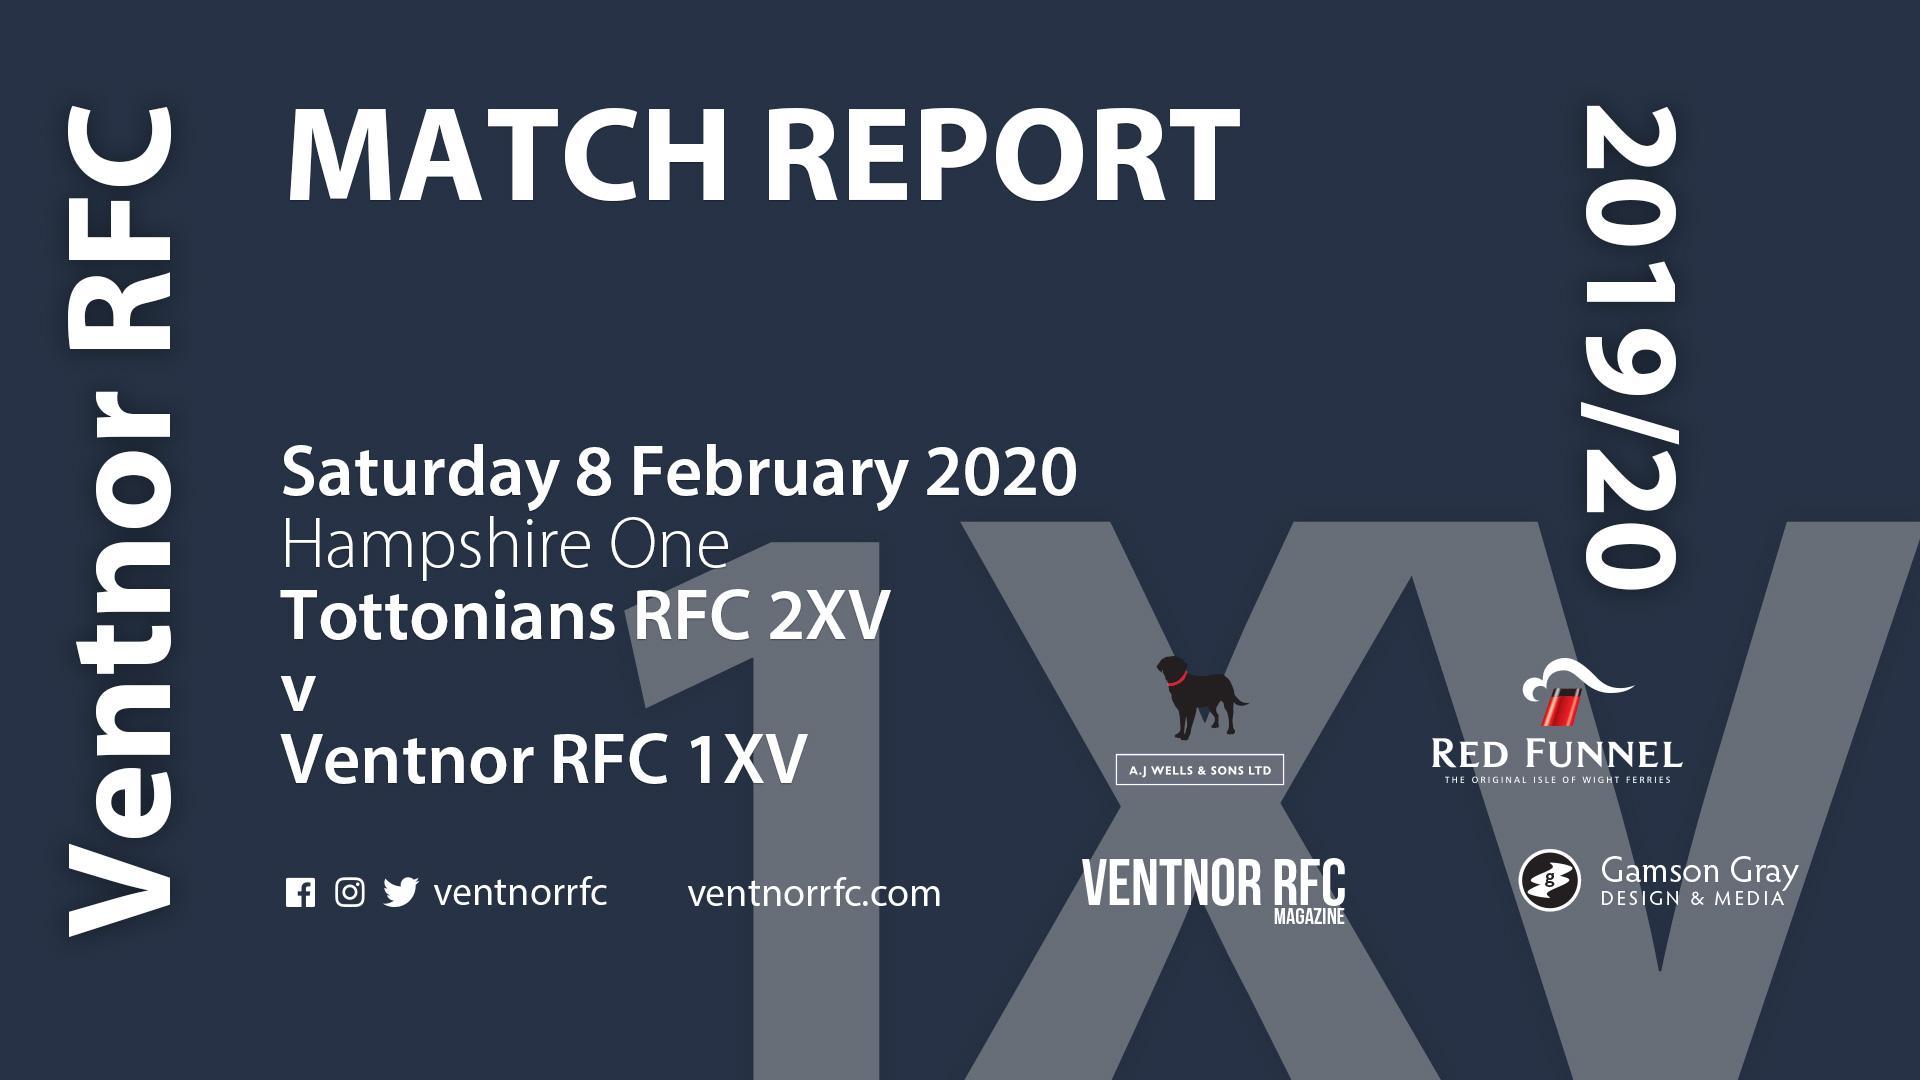 Tottonians-RFC-2XV-98-7-Ventnor-RFC-1XV,-8-February-2020-match-report-8-february-2020